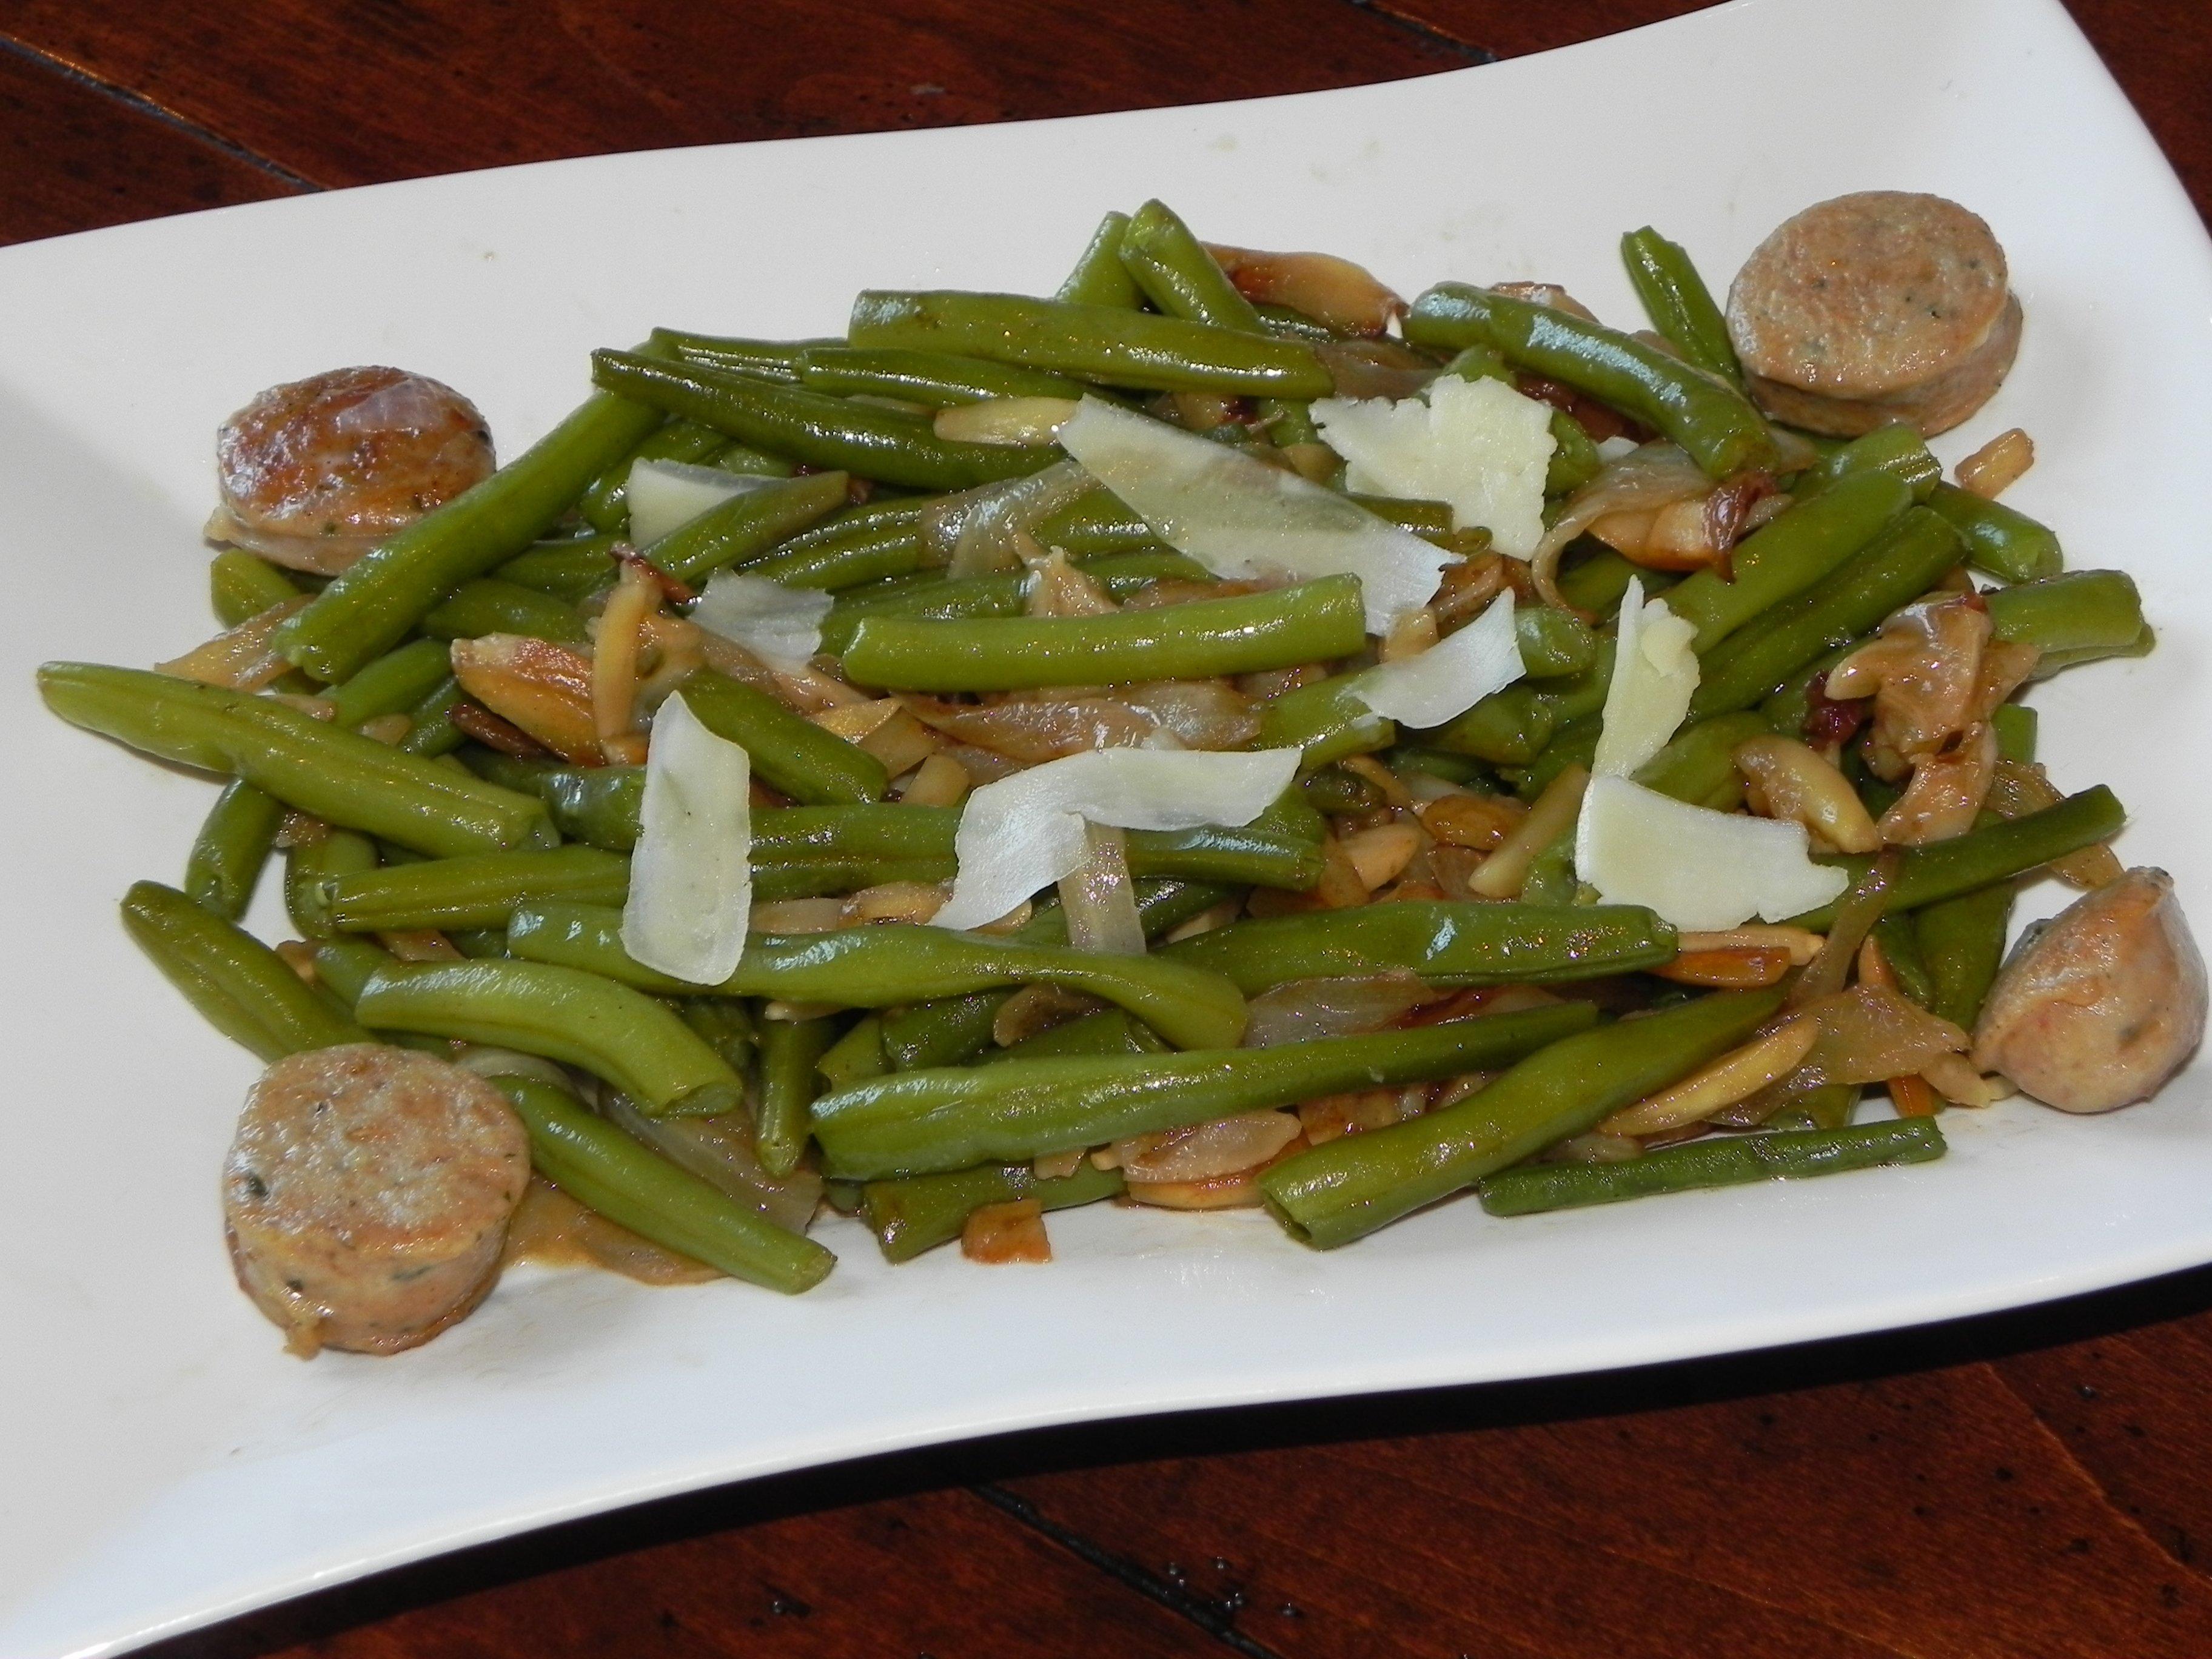 ... green beans sesame green beans feisty green beans spanish green beans